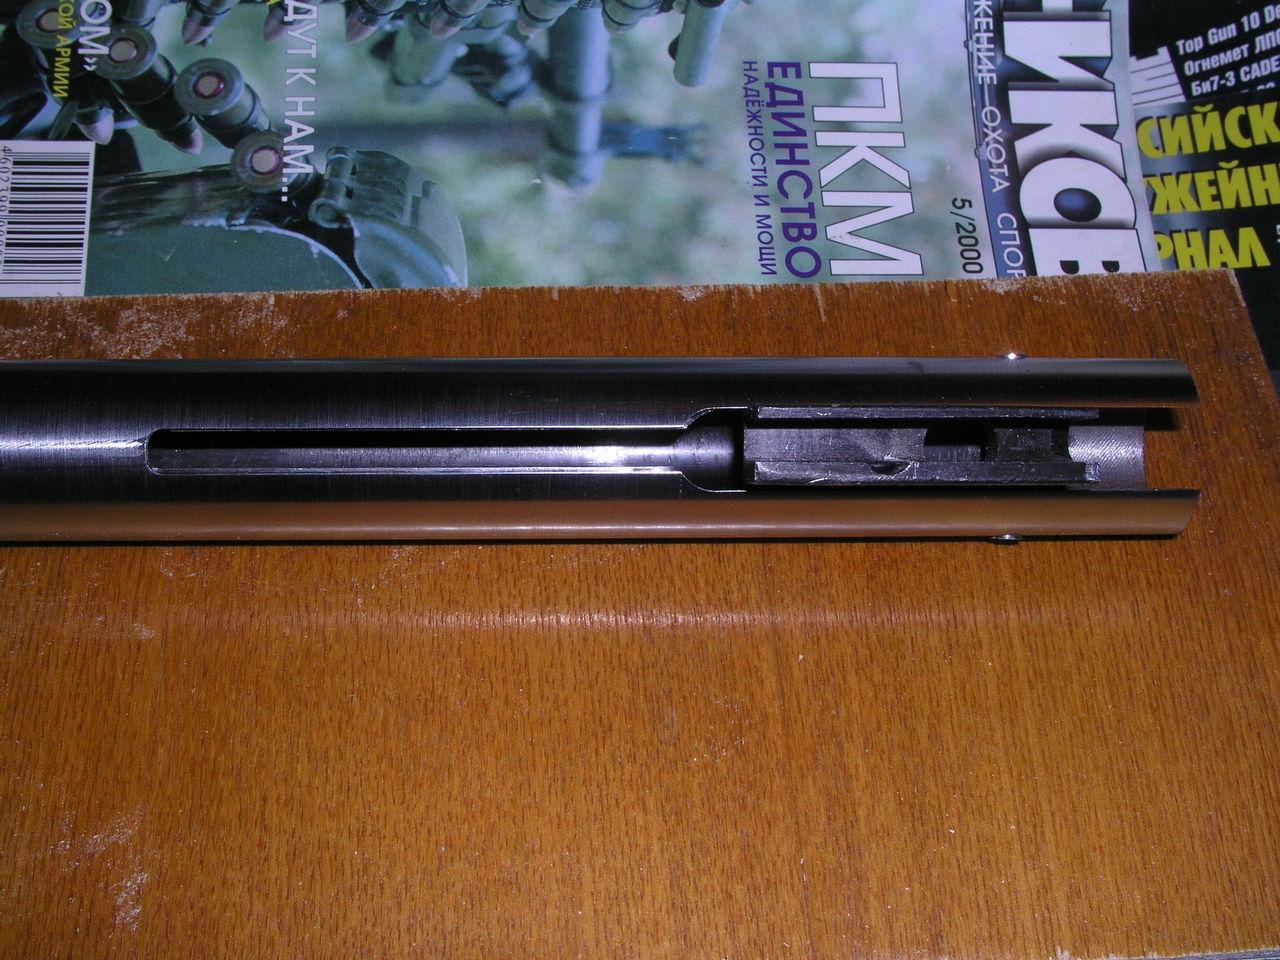 МР-512-еще один откат\начало\ * Популярное оружие